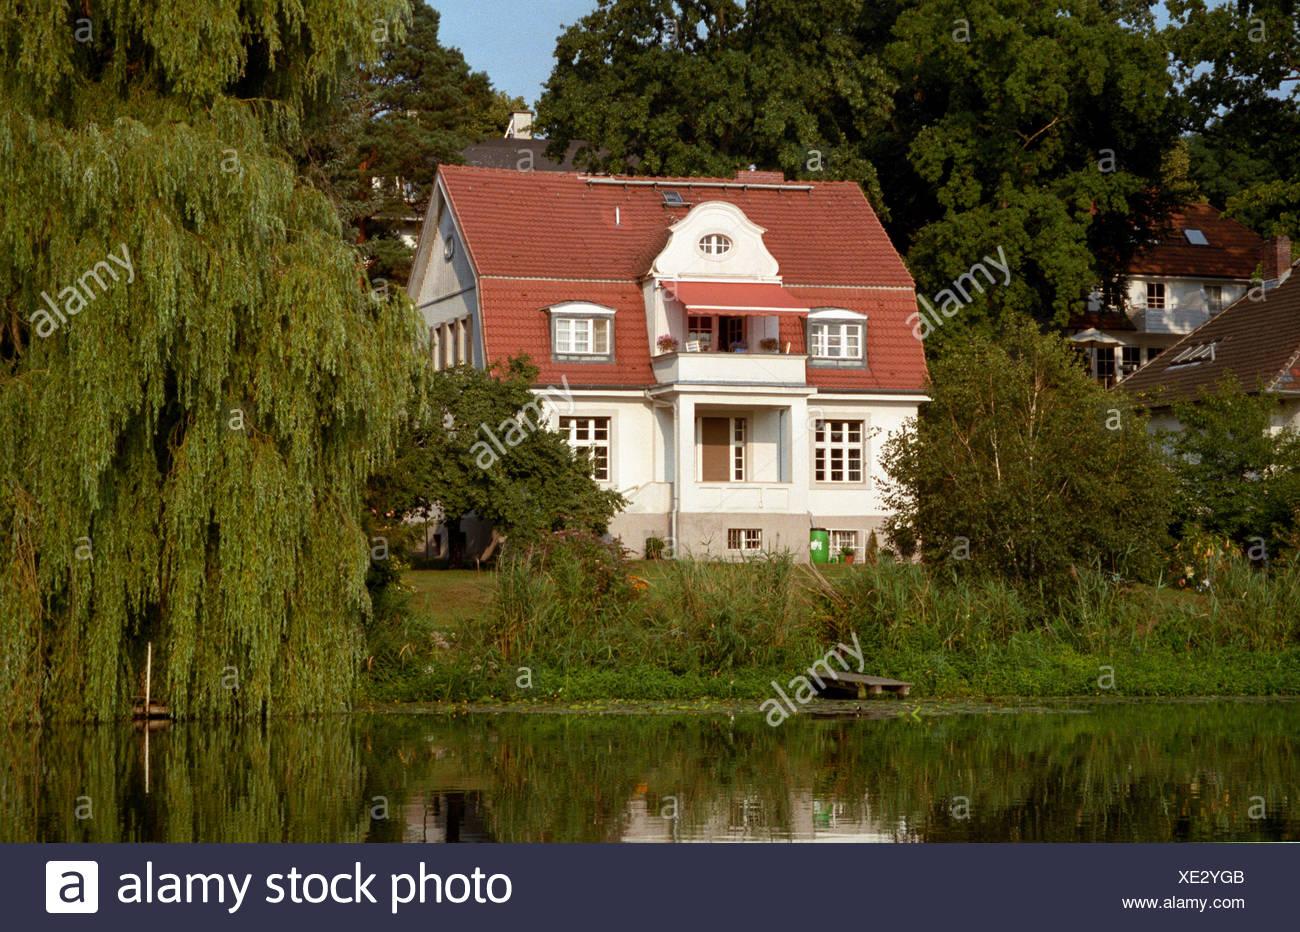 garden berlin villa villas idyll gardens detached house suburb bank ...